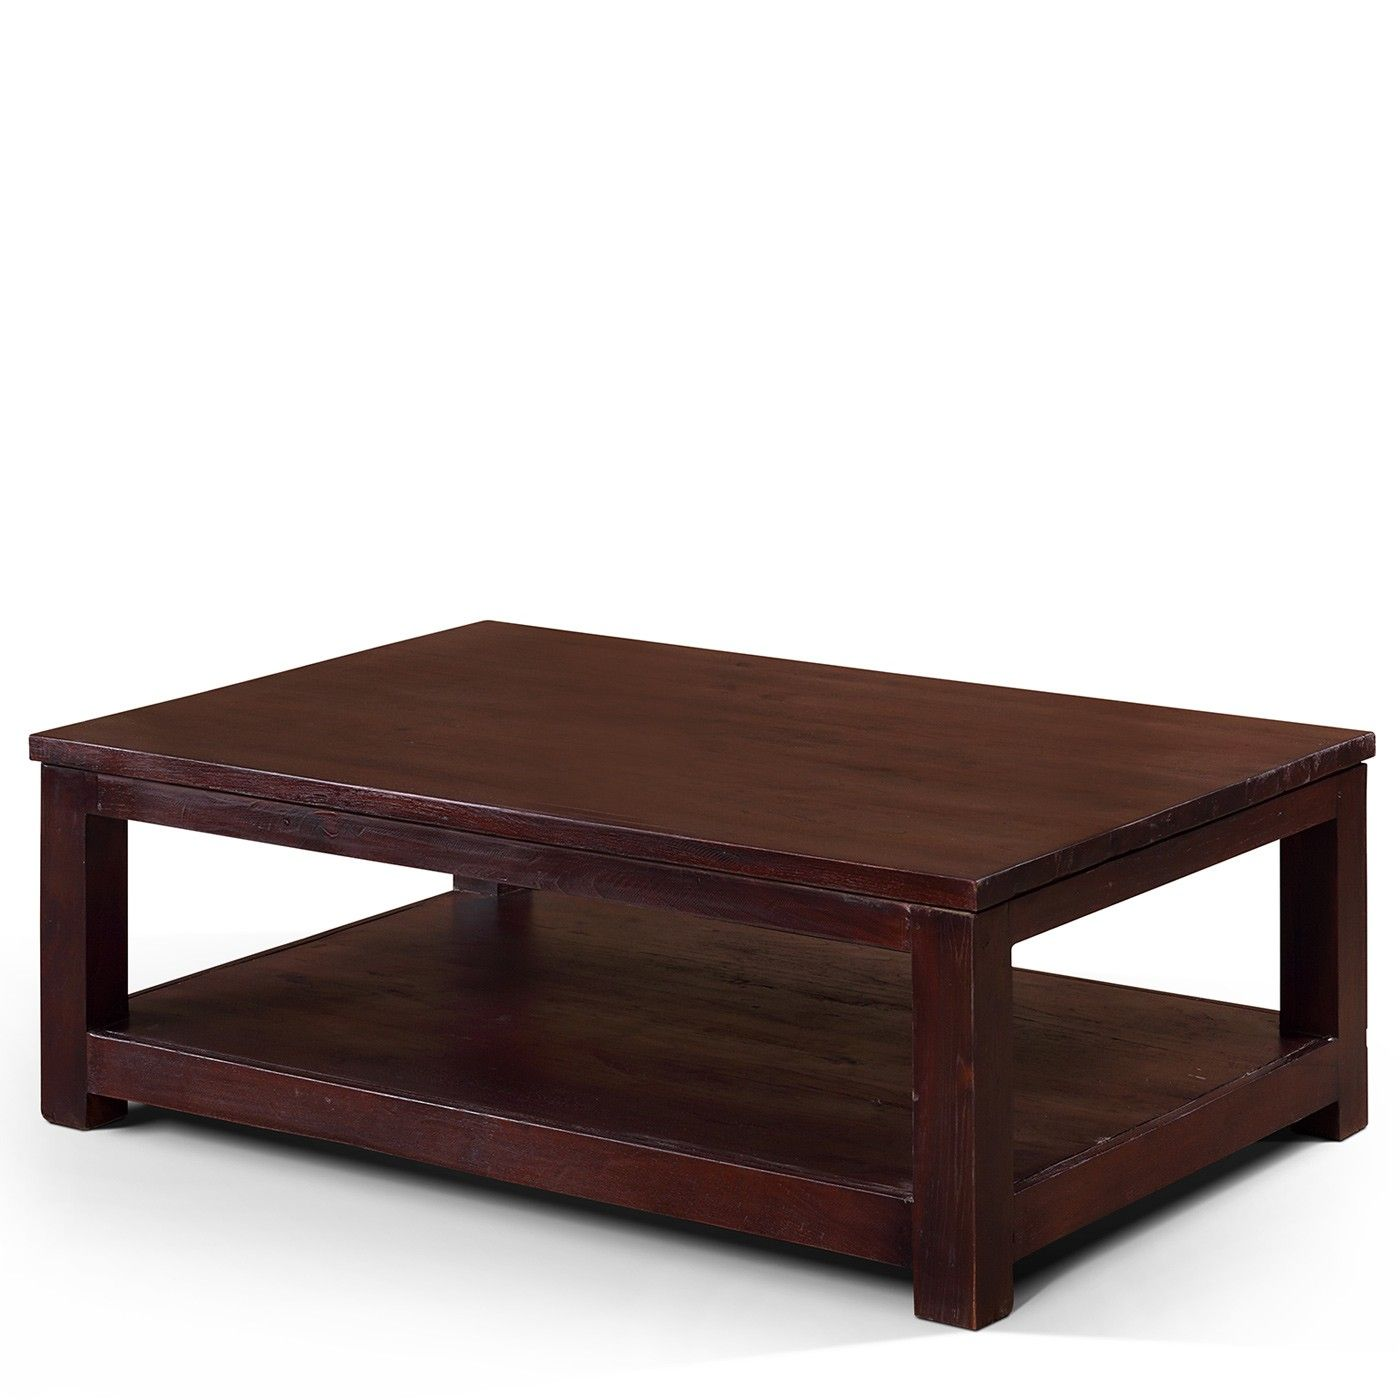 Mahogany Coffee Table With Glass Top Mahogany Coffee Table Cheap Coffee Table 3 Piece Coffee Table Set [ 800 x 1200 Pixel ]